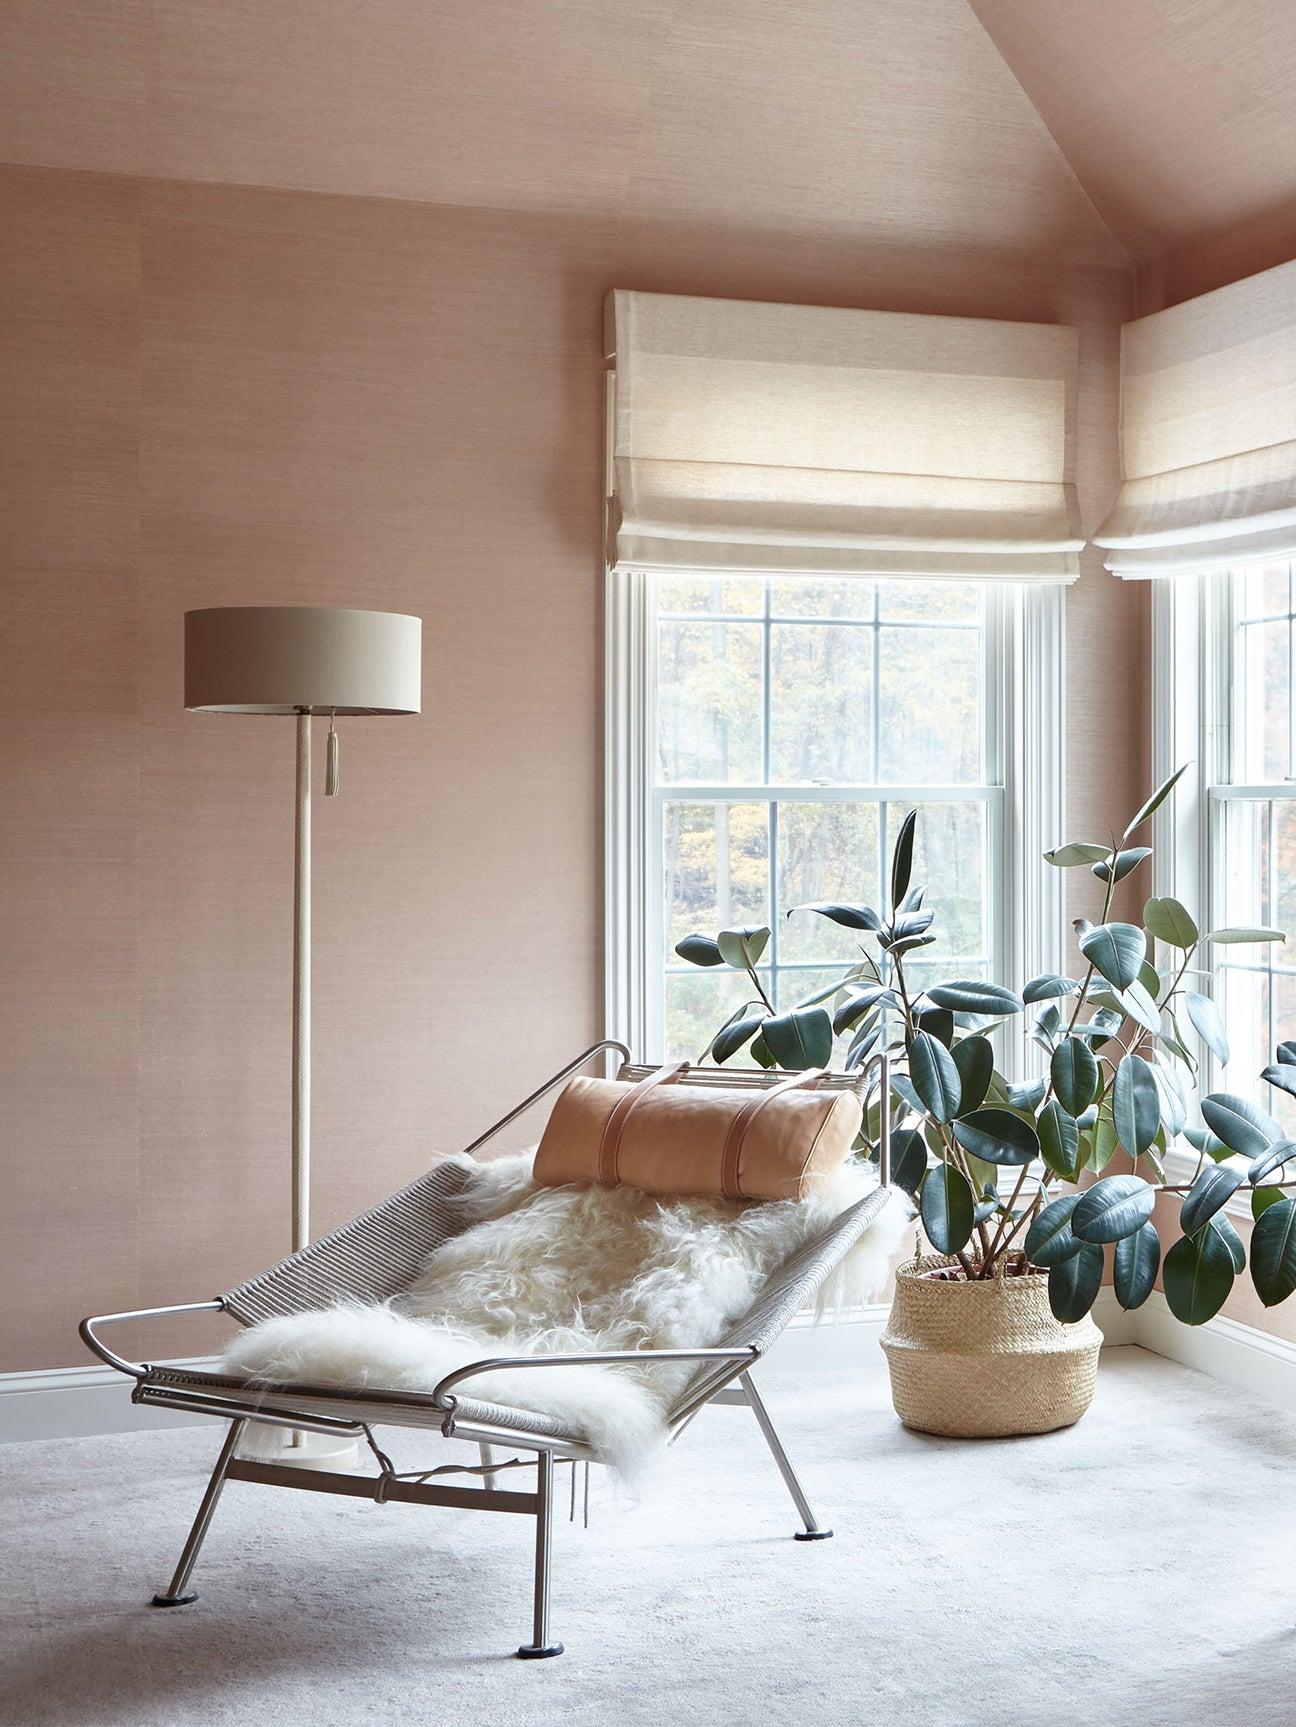 00-FEATURE-bedroom-closet-renovation-domino